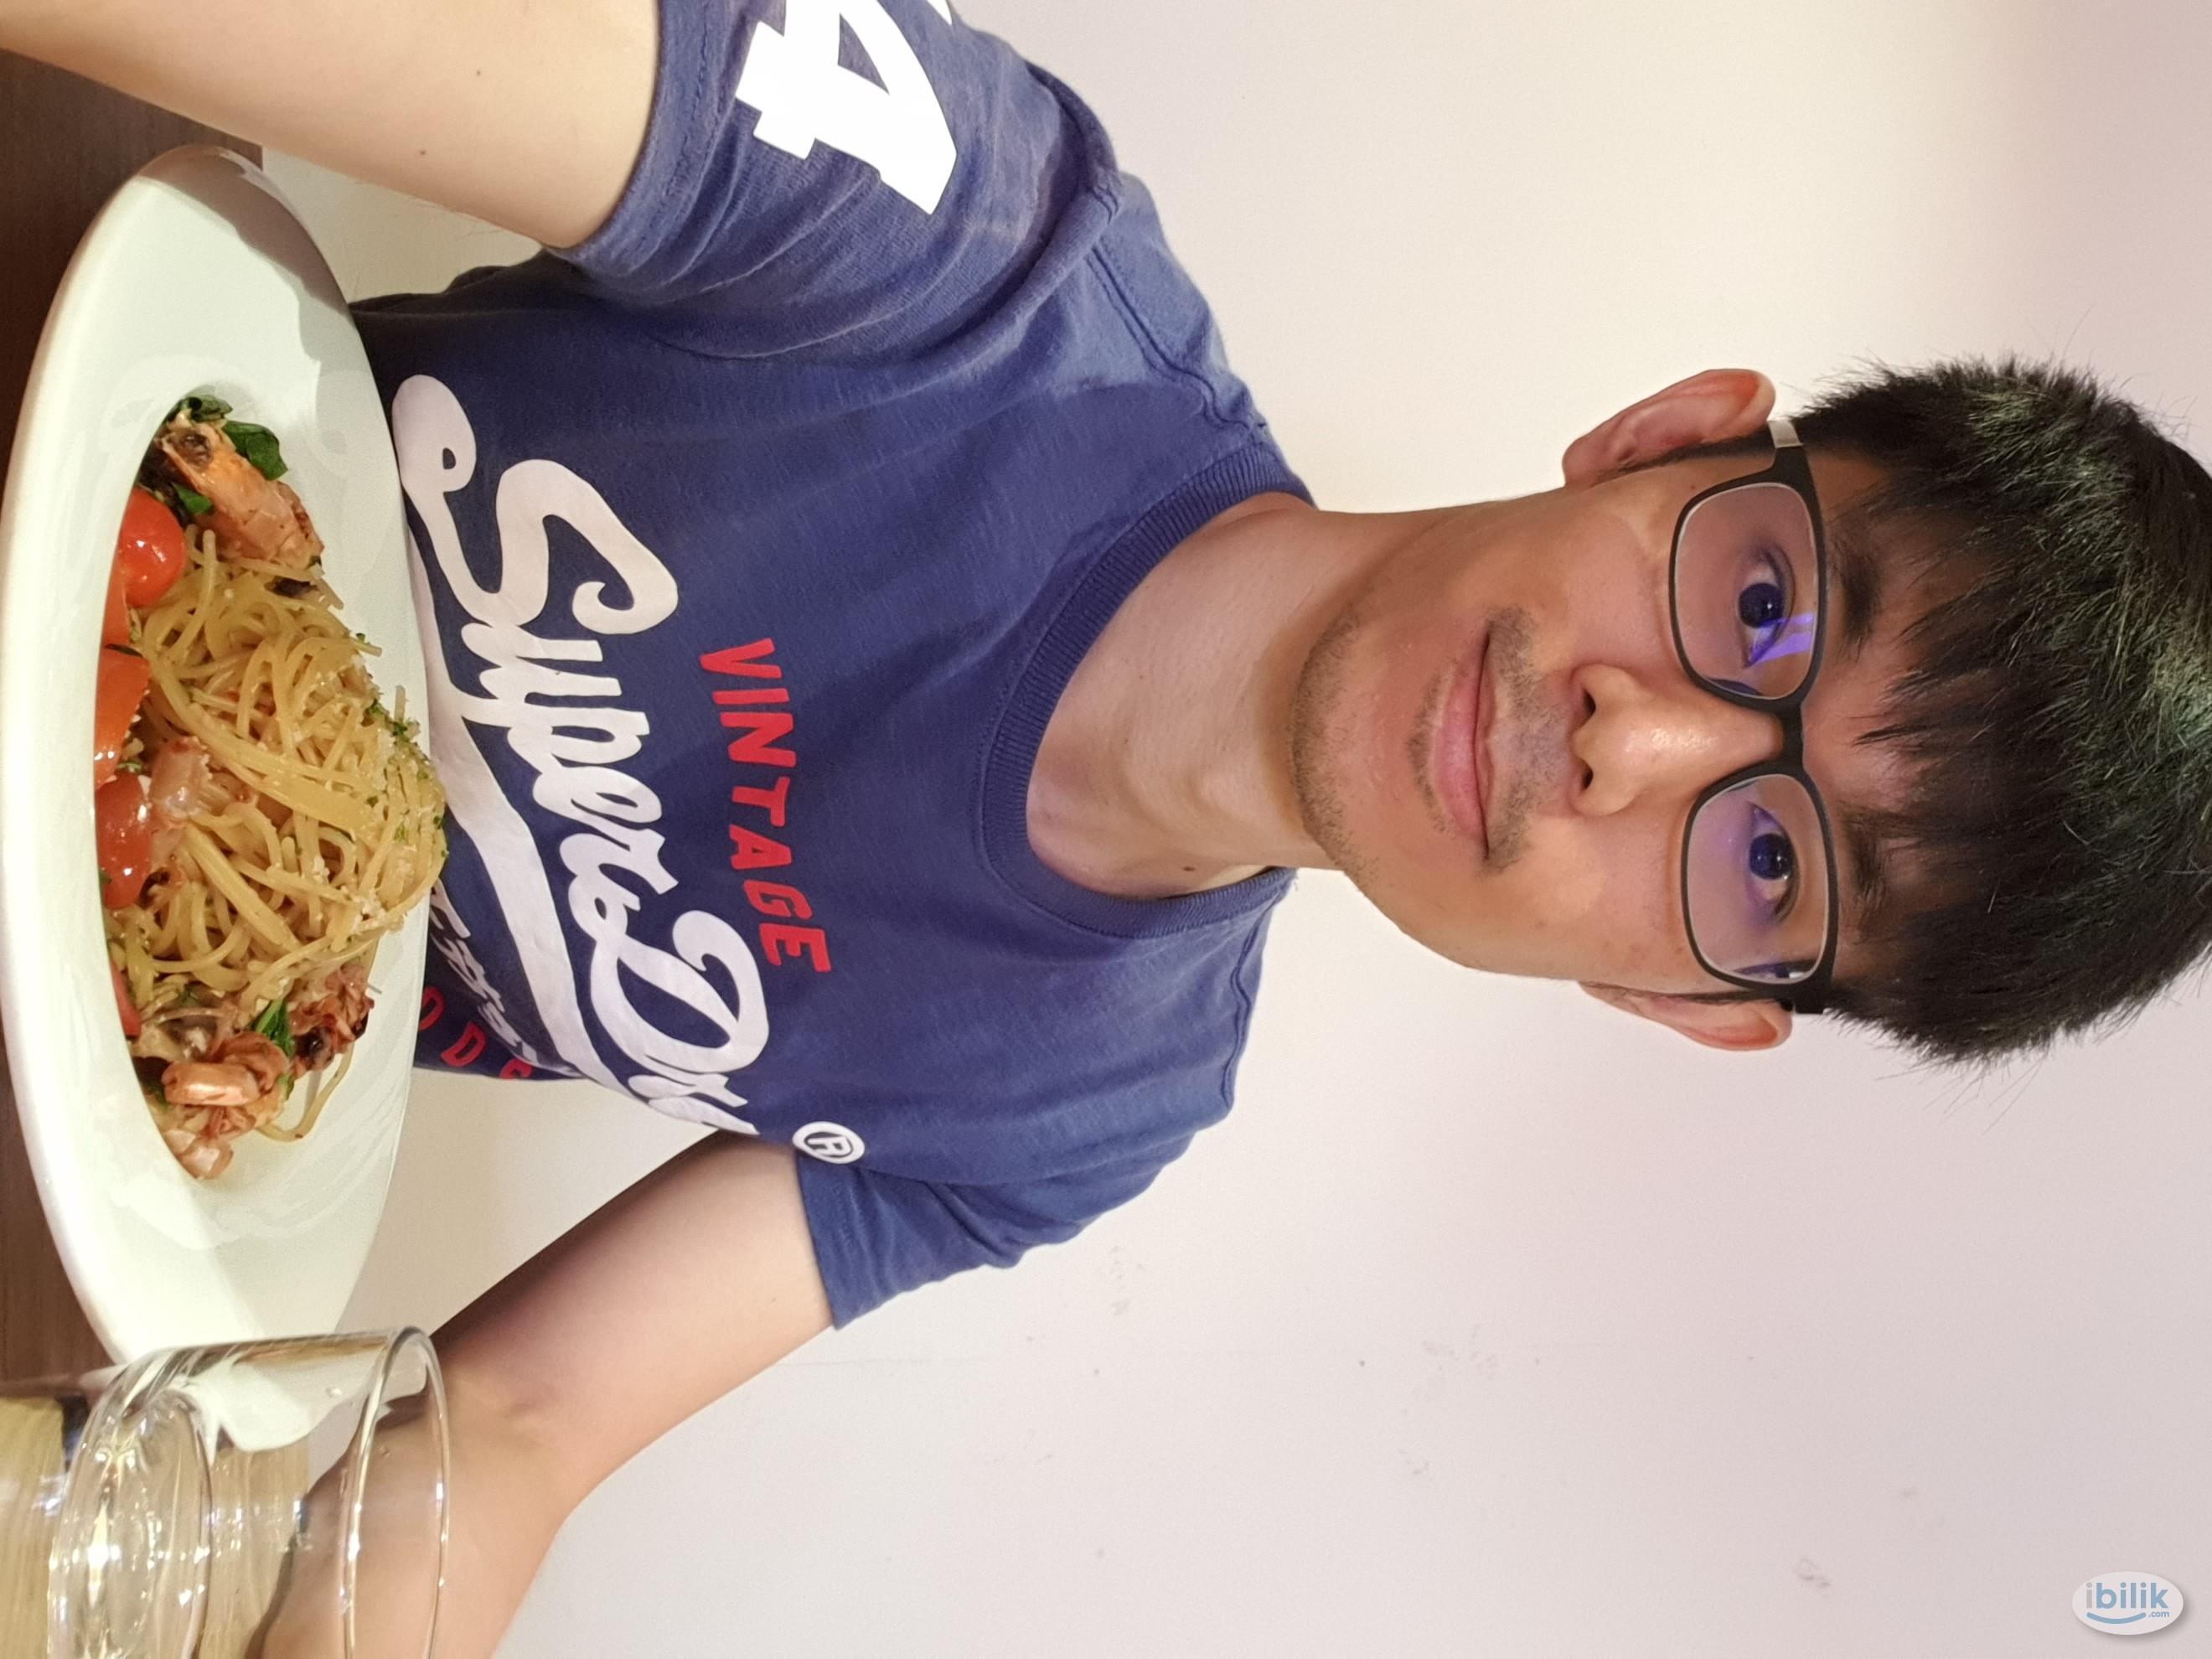 Keng Leong